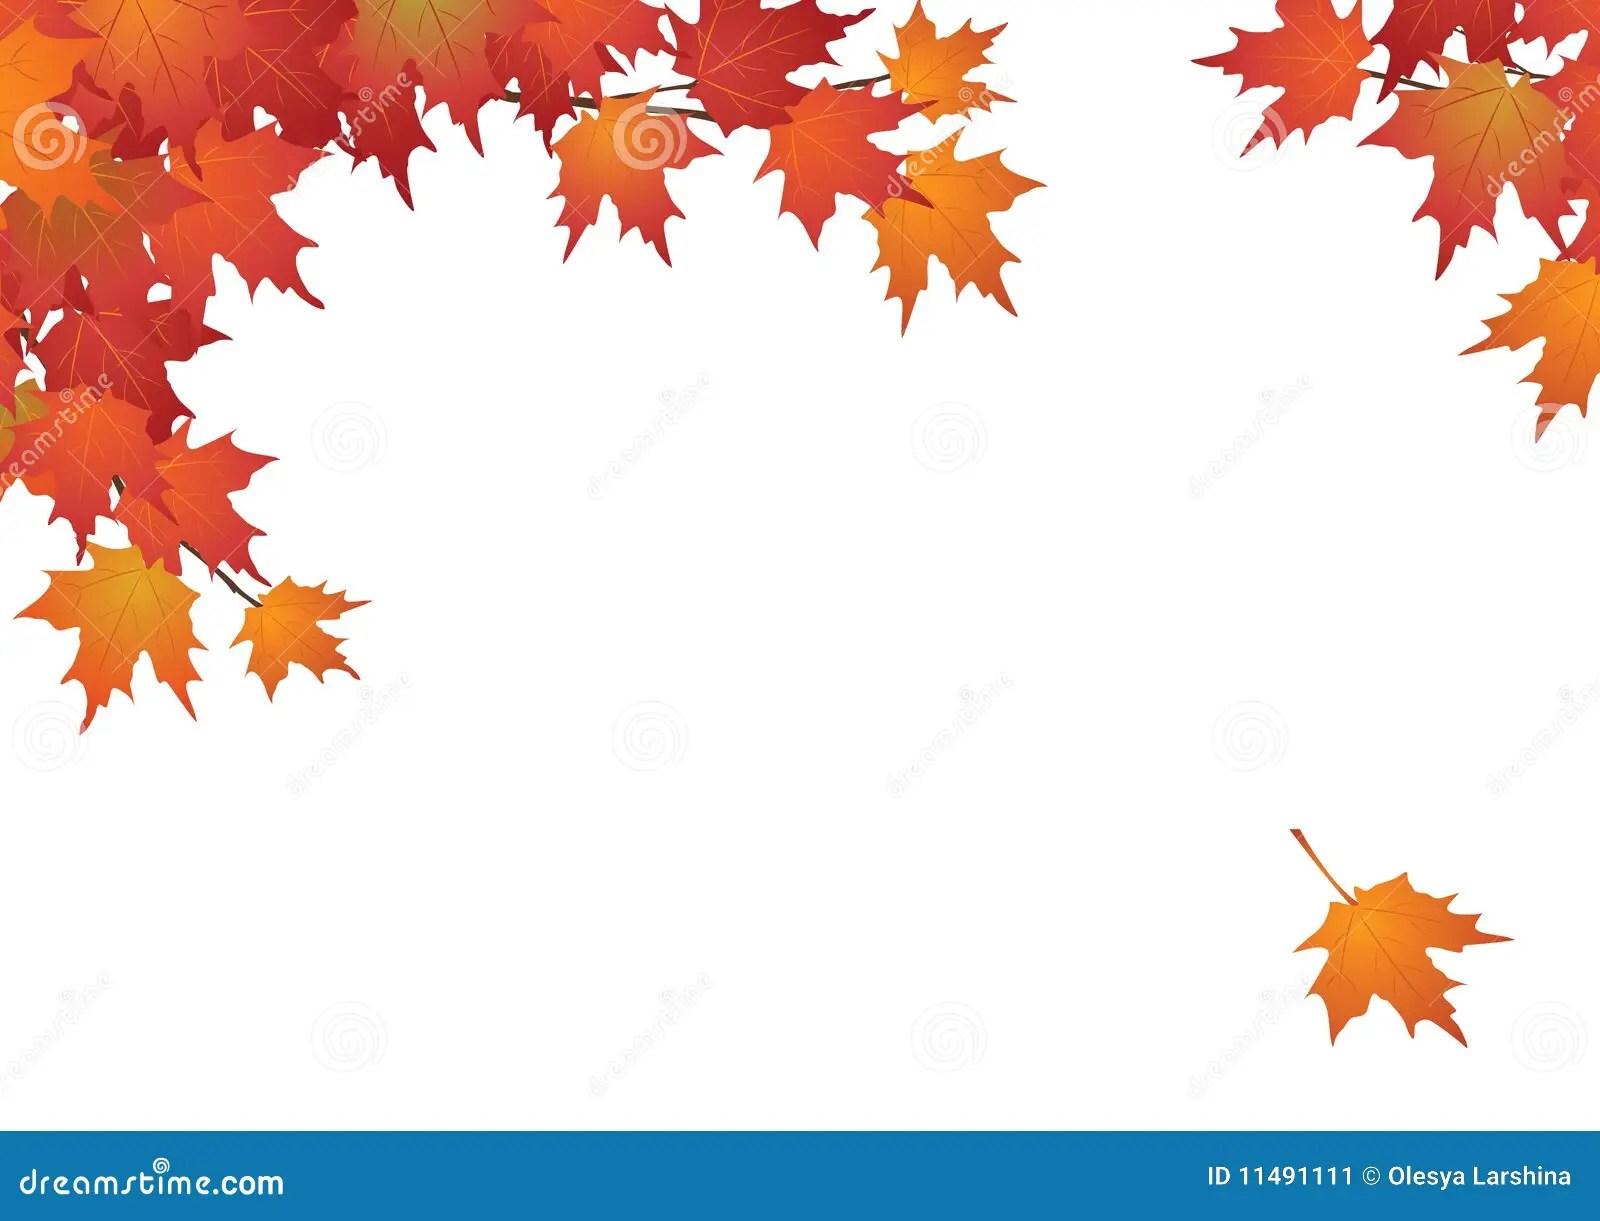 Fall Leaves Wallpaper Border De Bladeren Van De Achtergrond Herfst Frame Vector